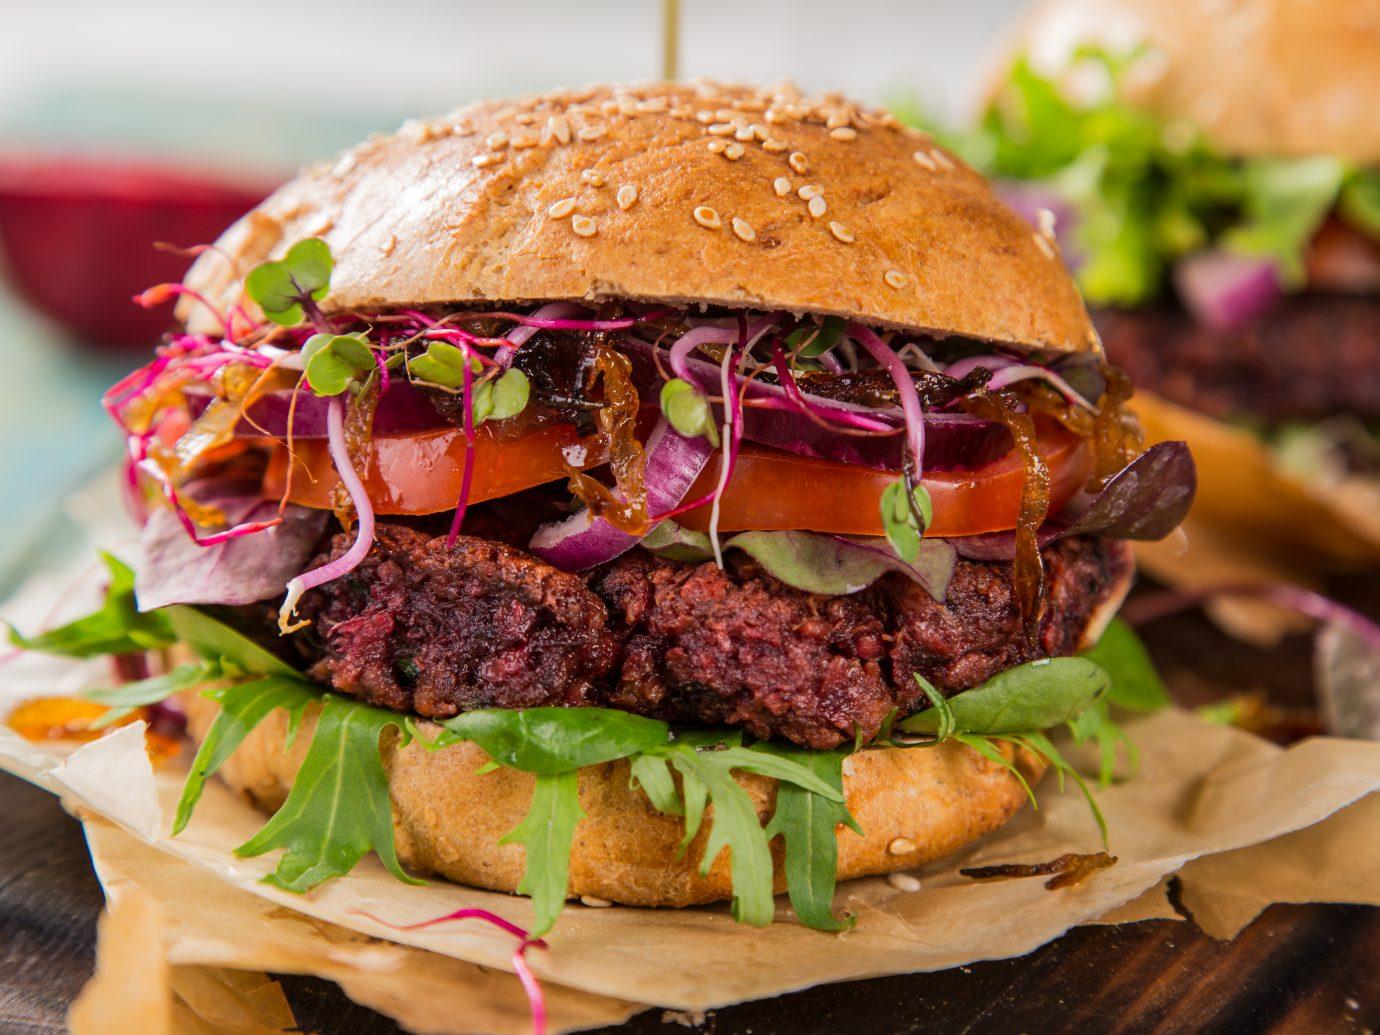 Close-up of home made vegetarian red beet burgers on wooden table at The Slutty Vegan, Atlanta, GA